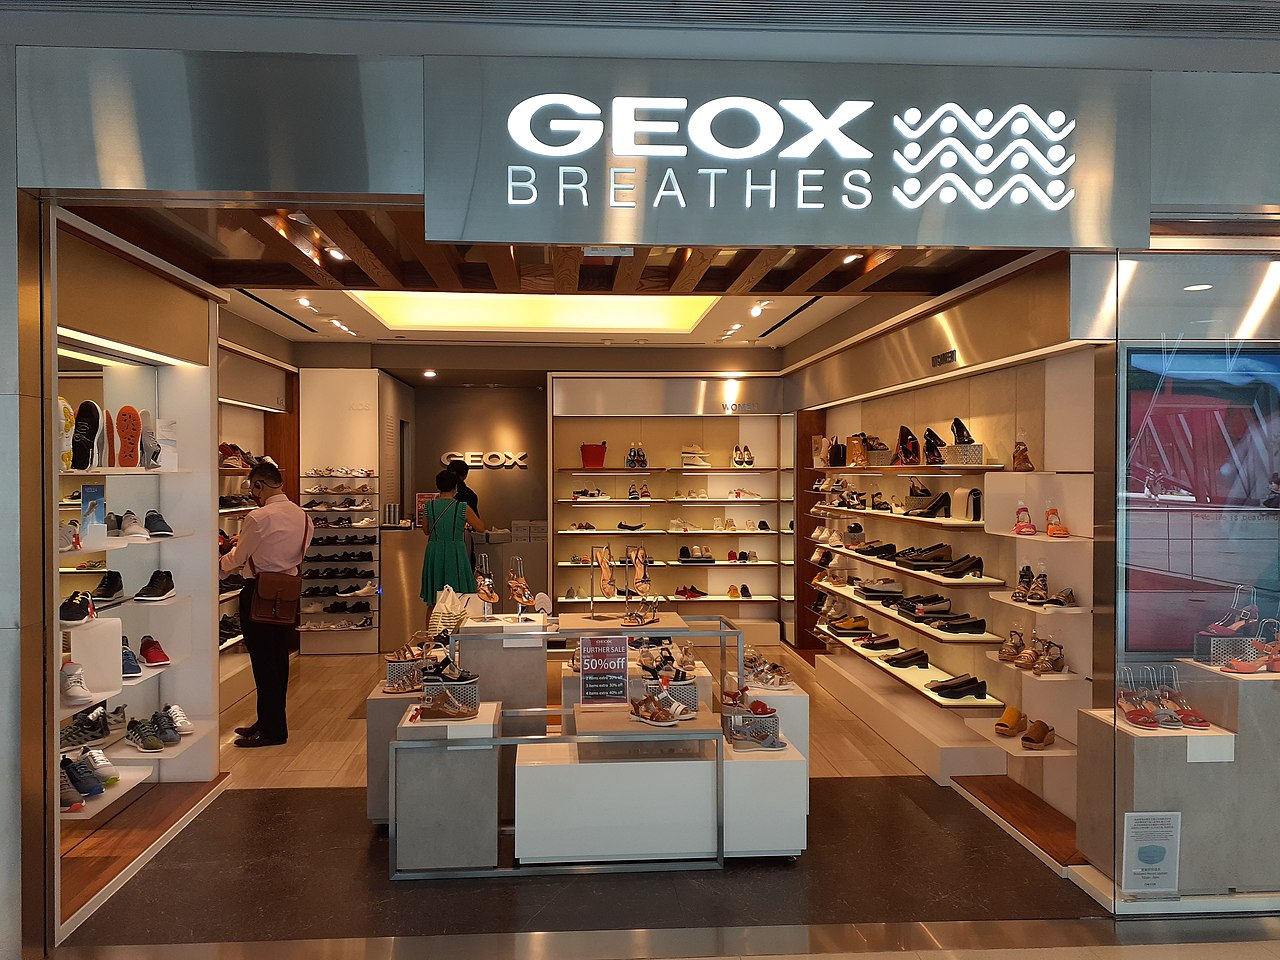 ven calificación pasillo  File:HK Central IFC Mall shop GEOX Breathes June 2020 SS2 02.jpg -  Wikimedia Commons